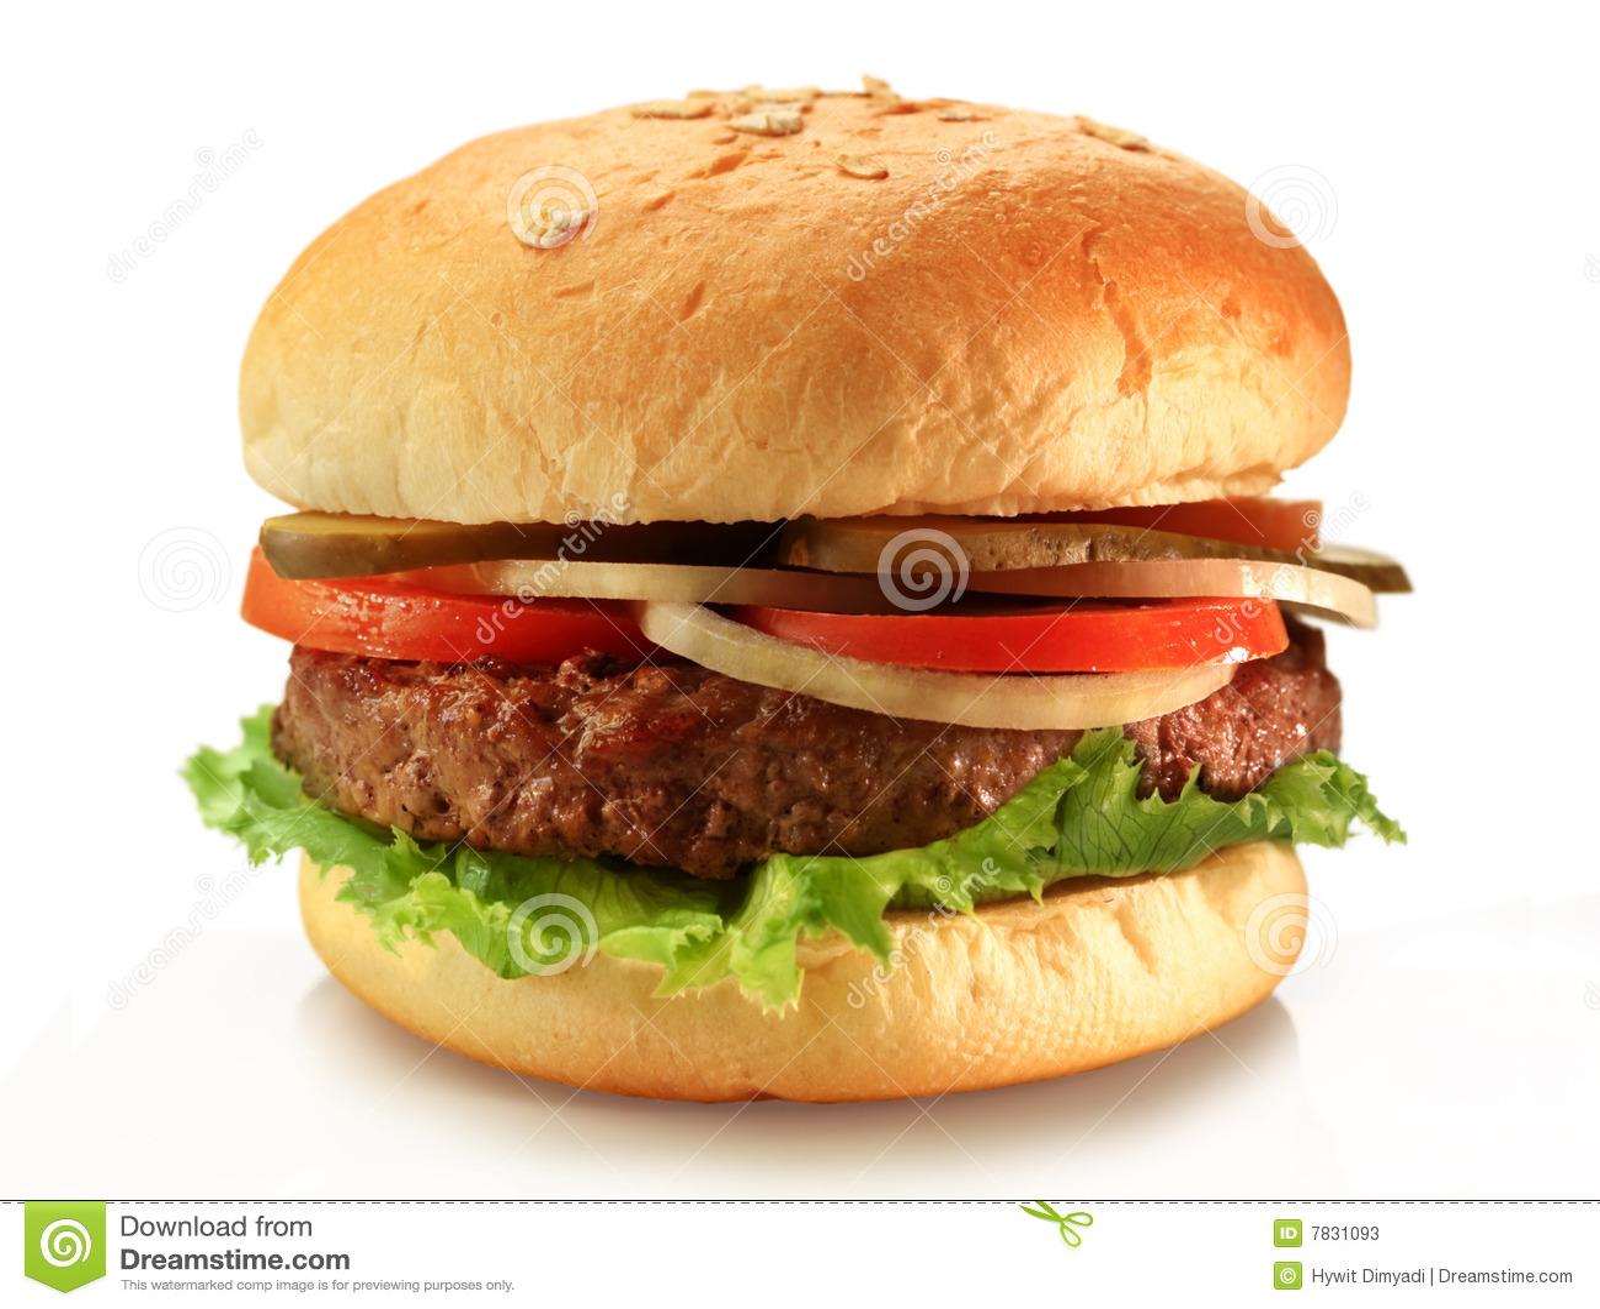 Juicy grilled hamburger on healthy rye buns.